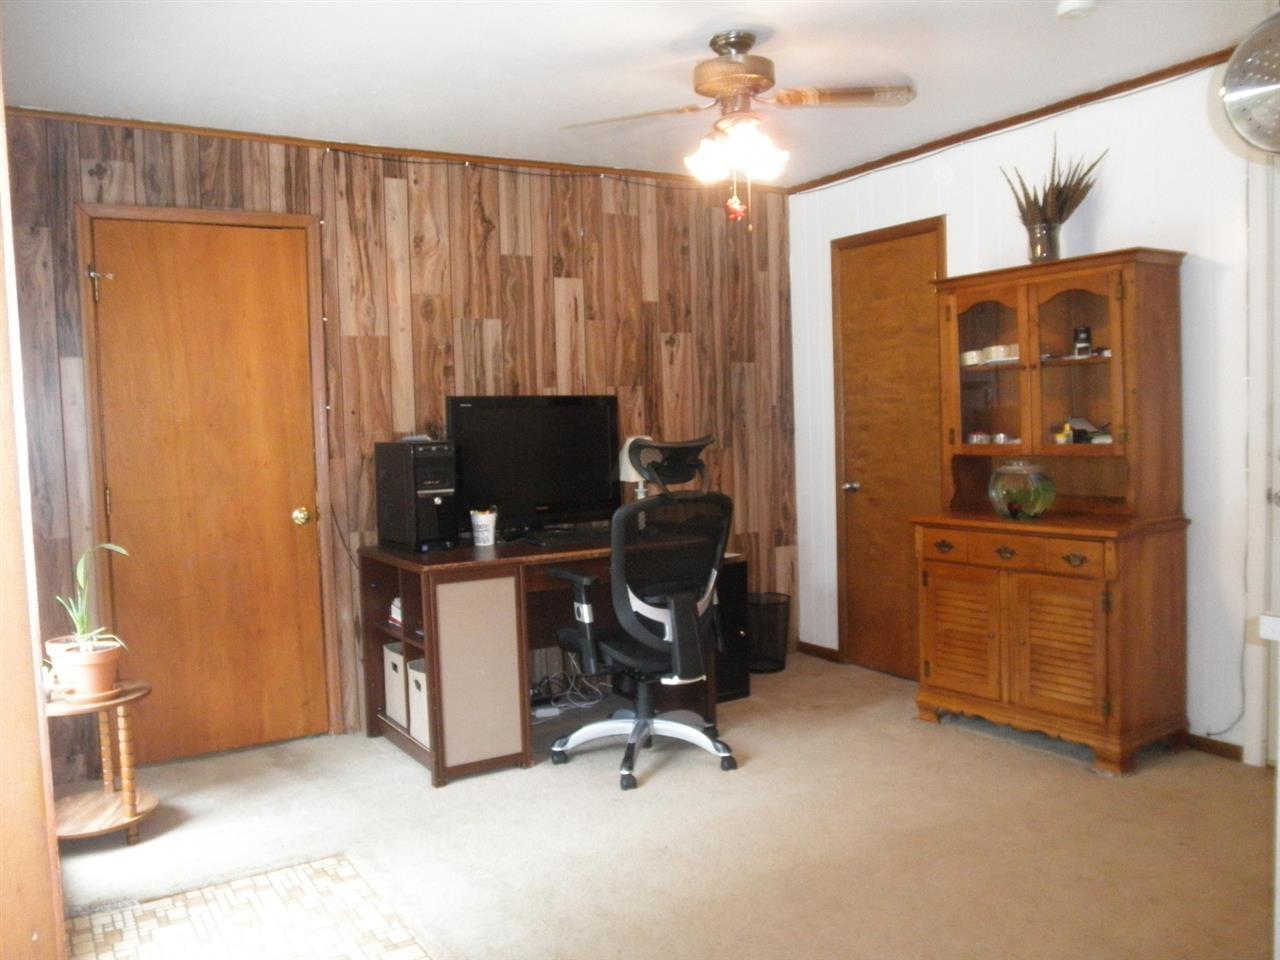 Sold Cross Sale W/ MLS | 808 Gray  Ponca City, OK 74604 18